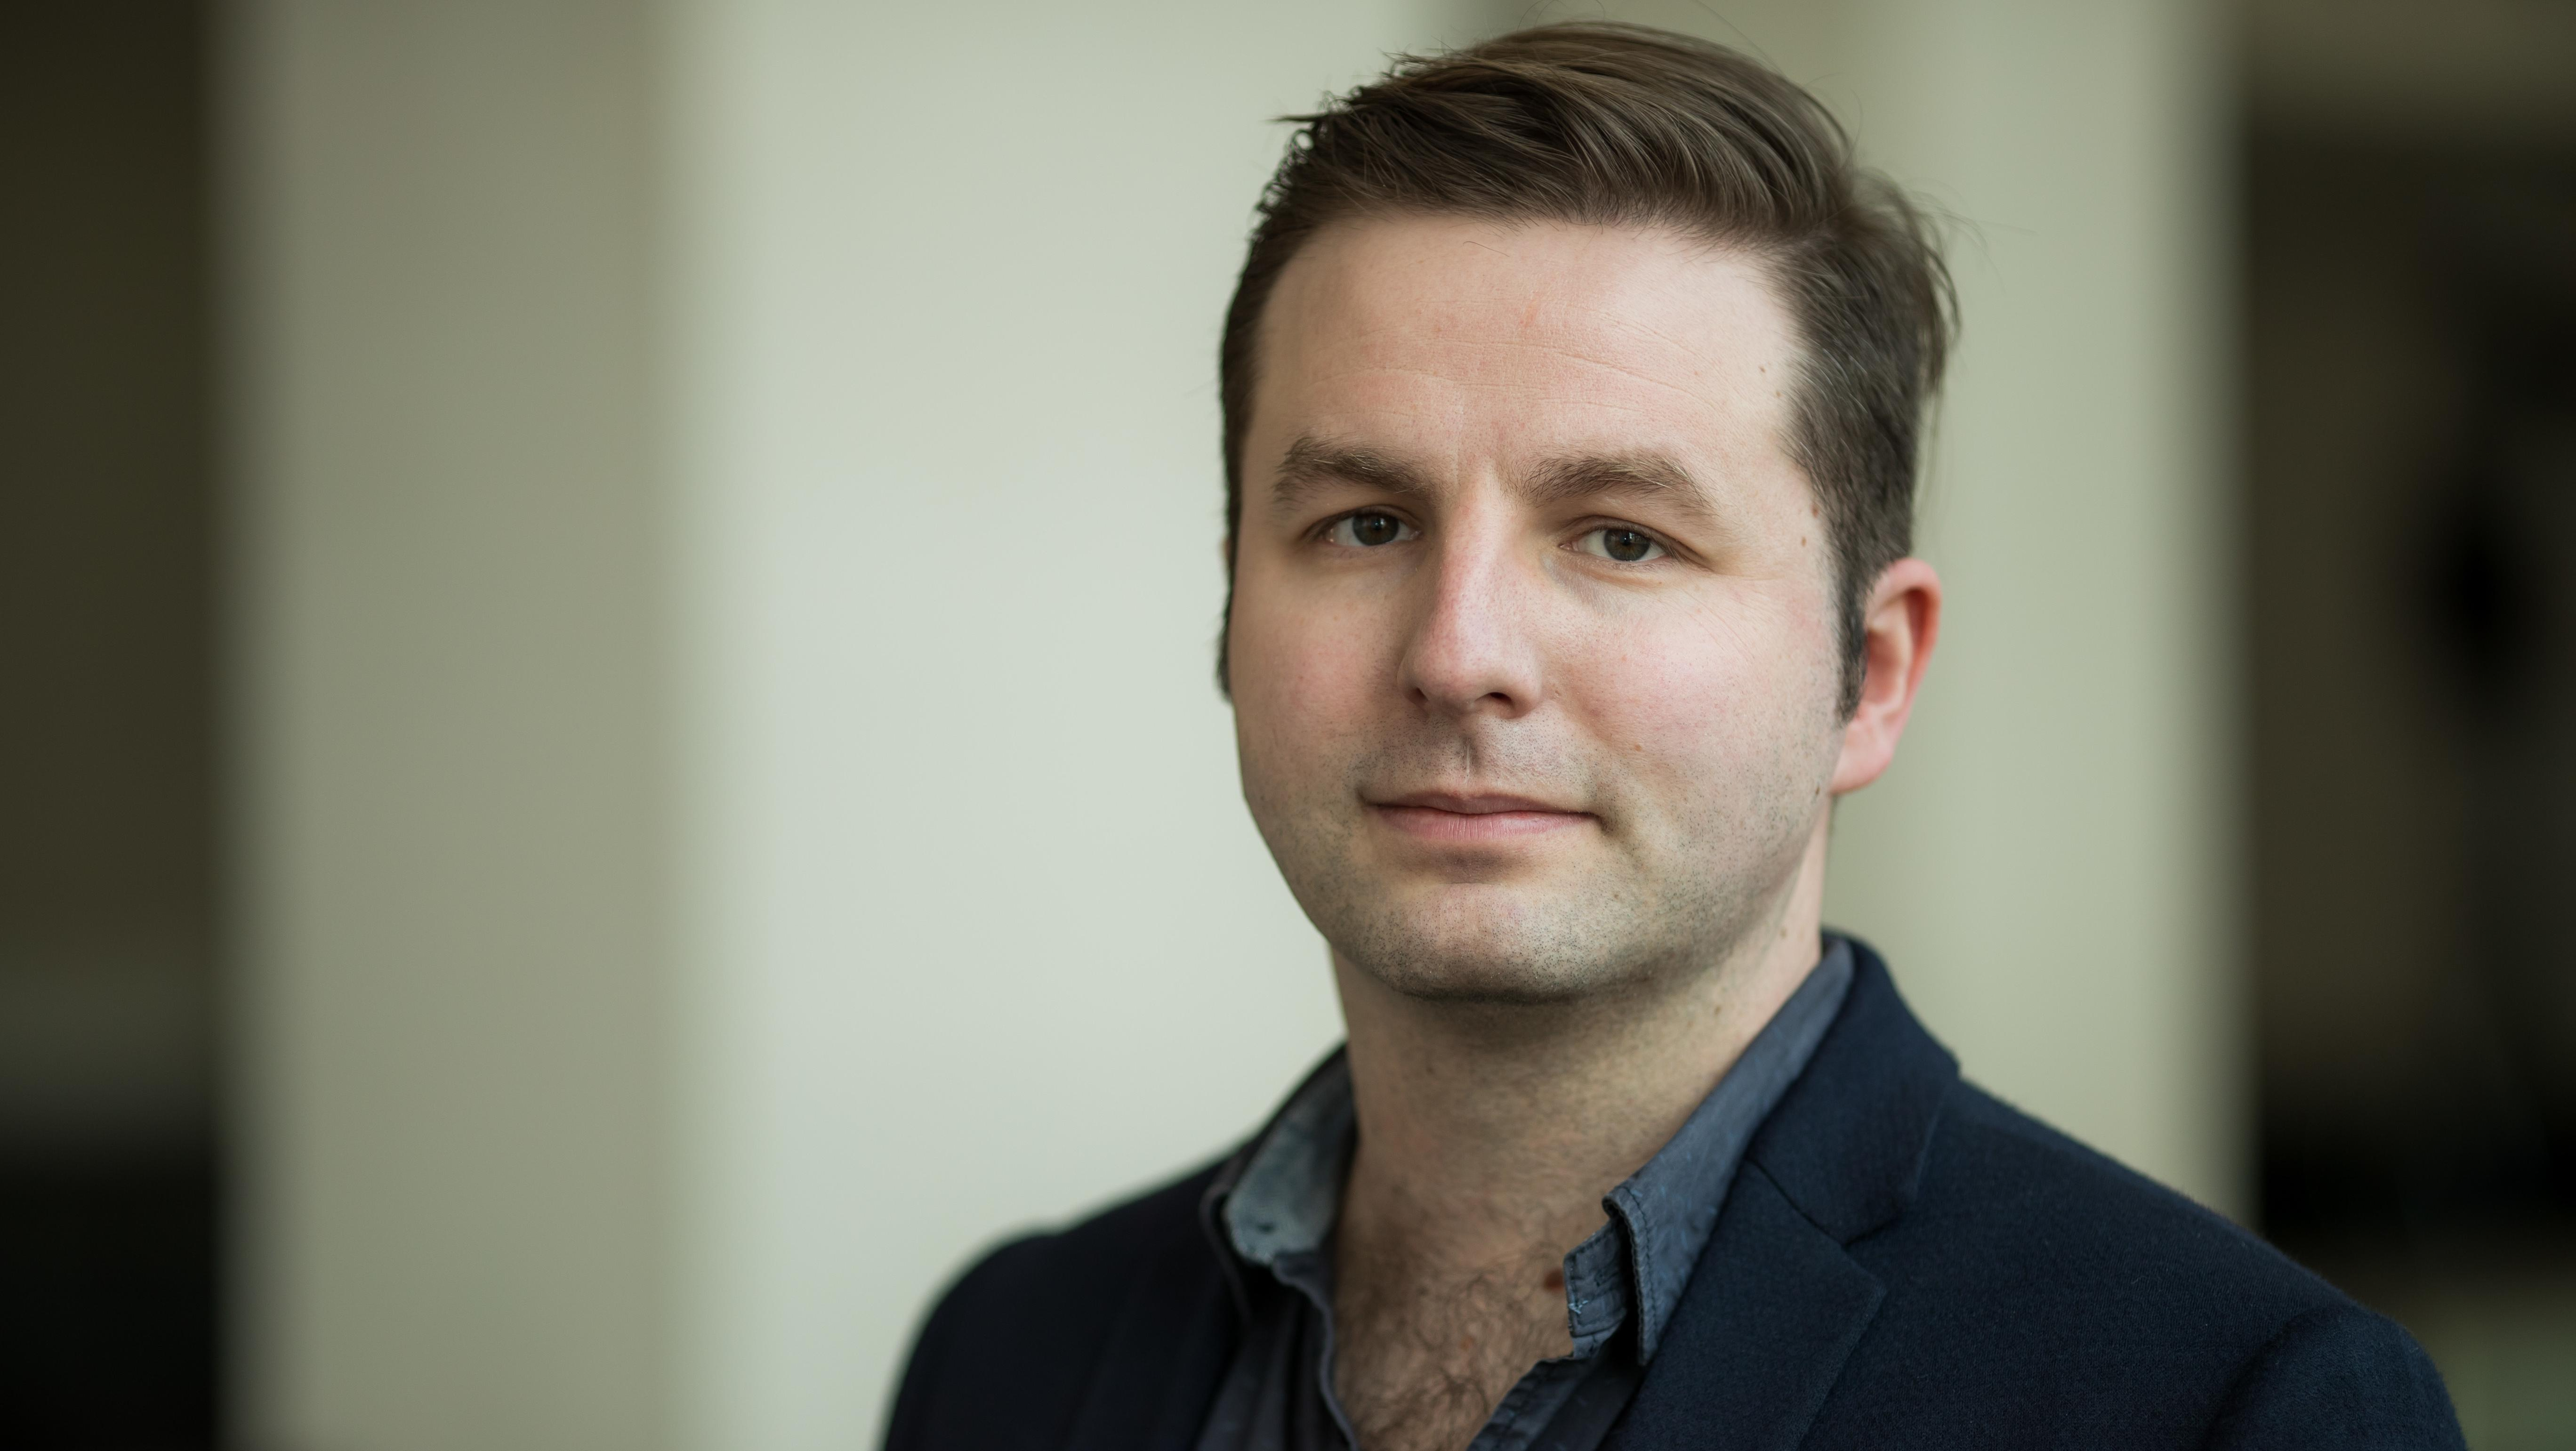 Schauspieldirektor Jan-Philipp Gloger